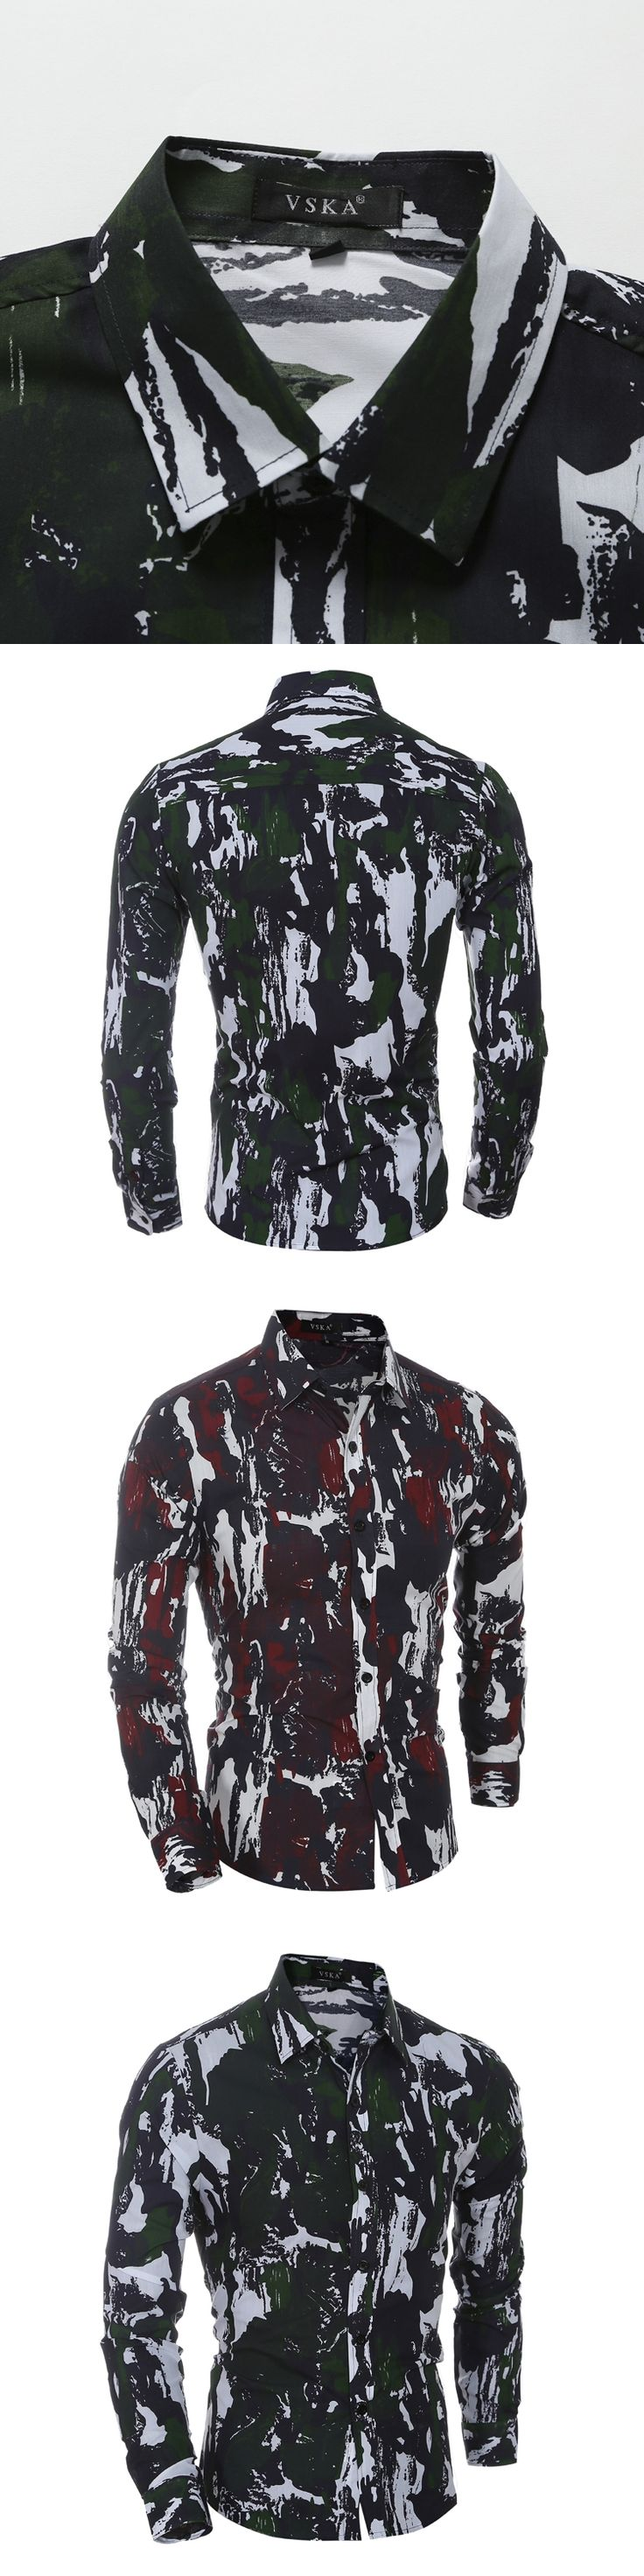 Camisas Hombre Vestir Dress Shirts Mens Shirt Slim Fit Chemise Homme Men Shirt Camouflage Jungle Heren Hemden Camisa Masculina